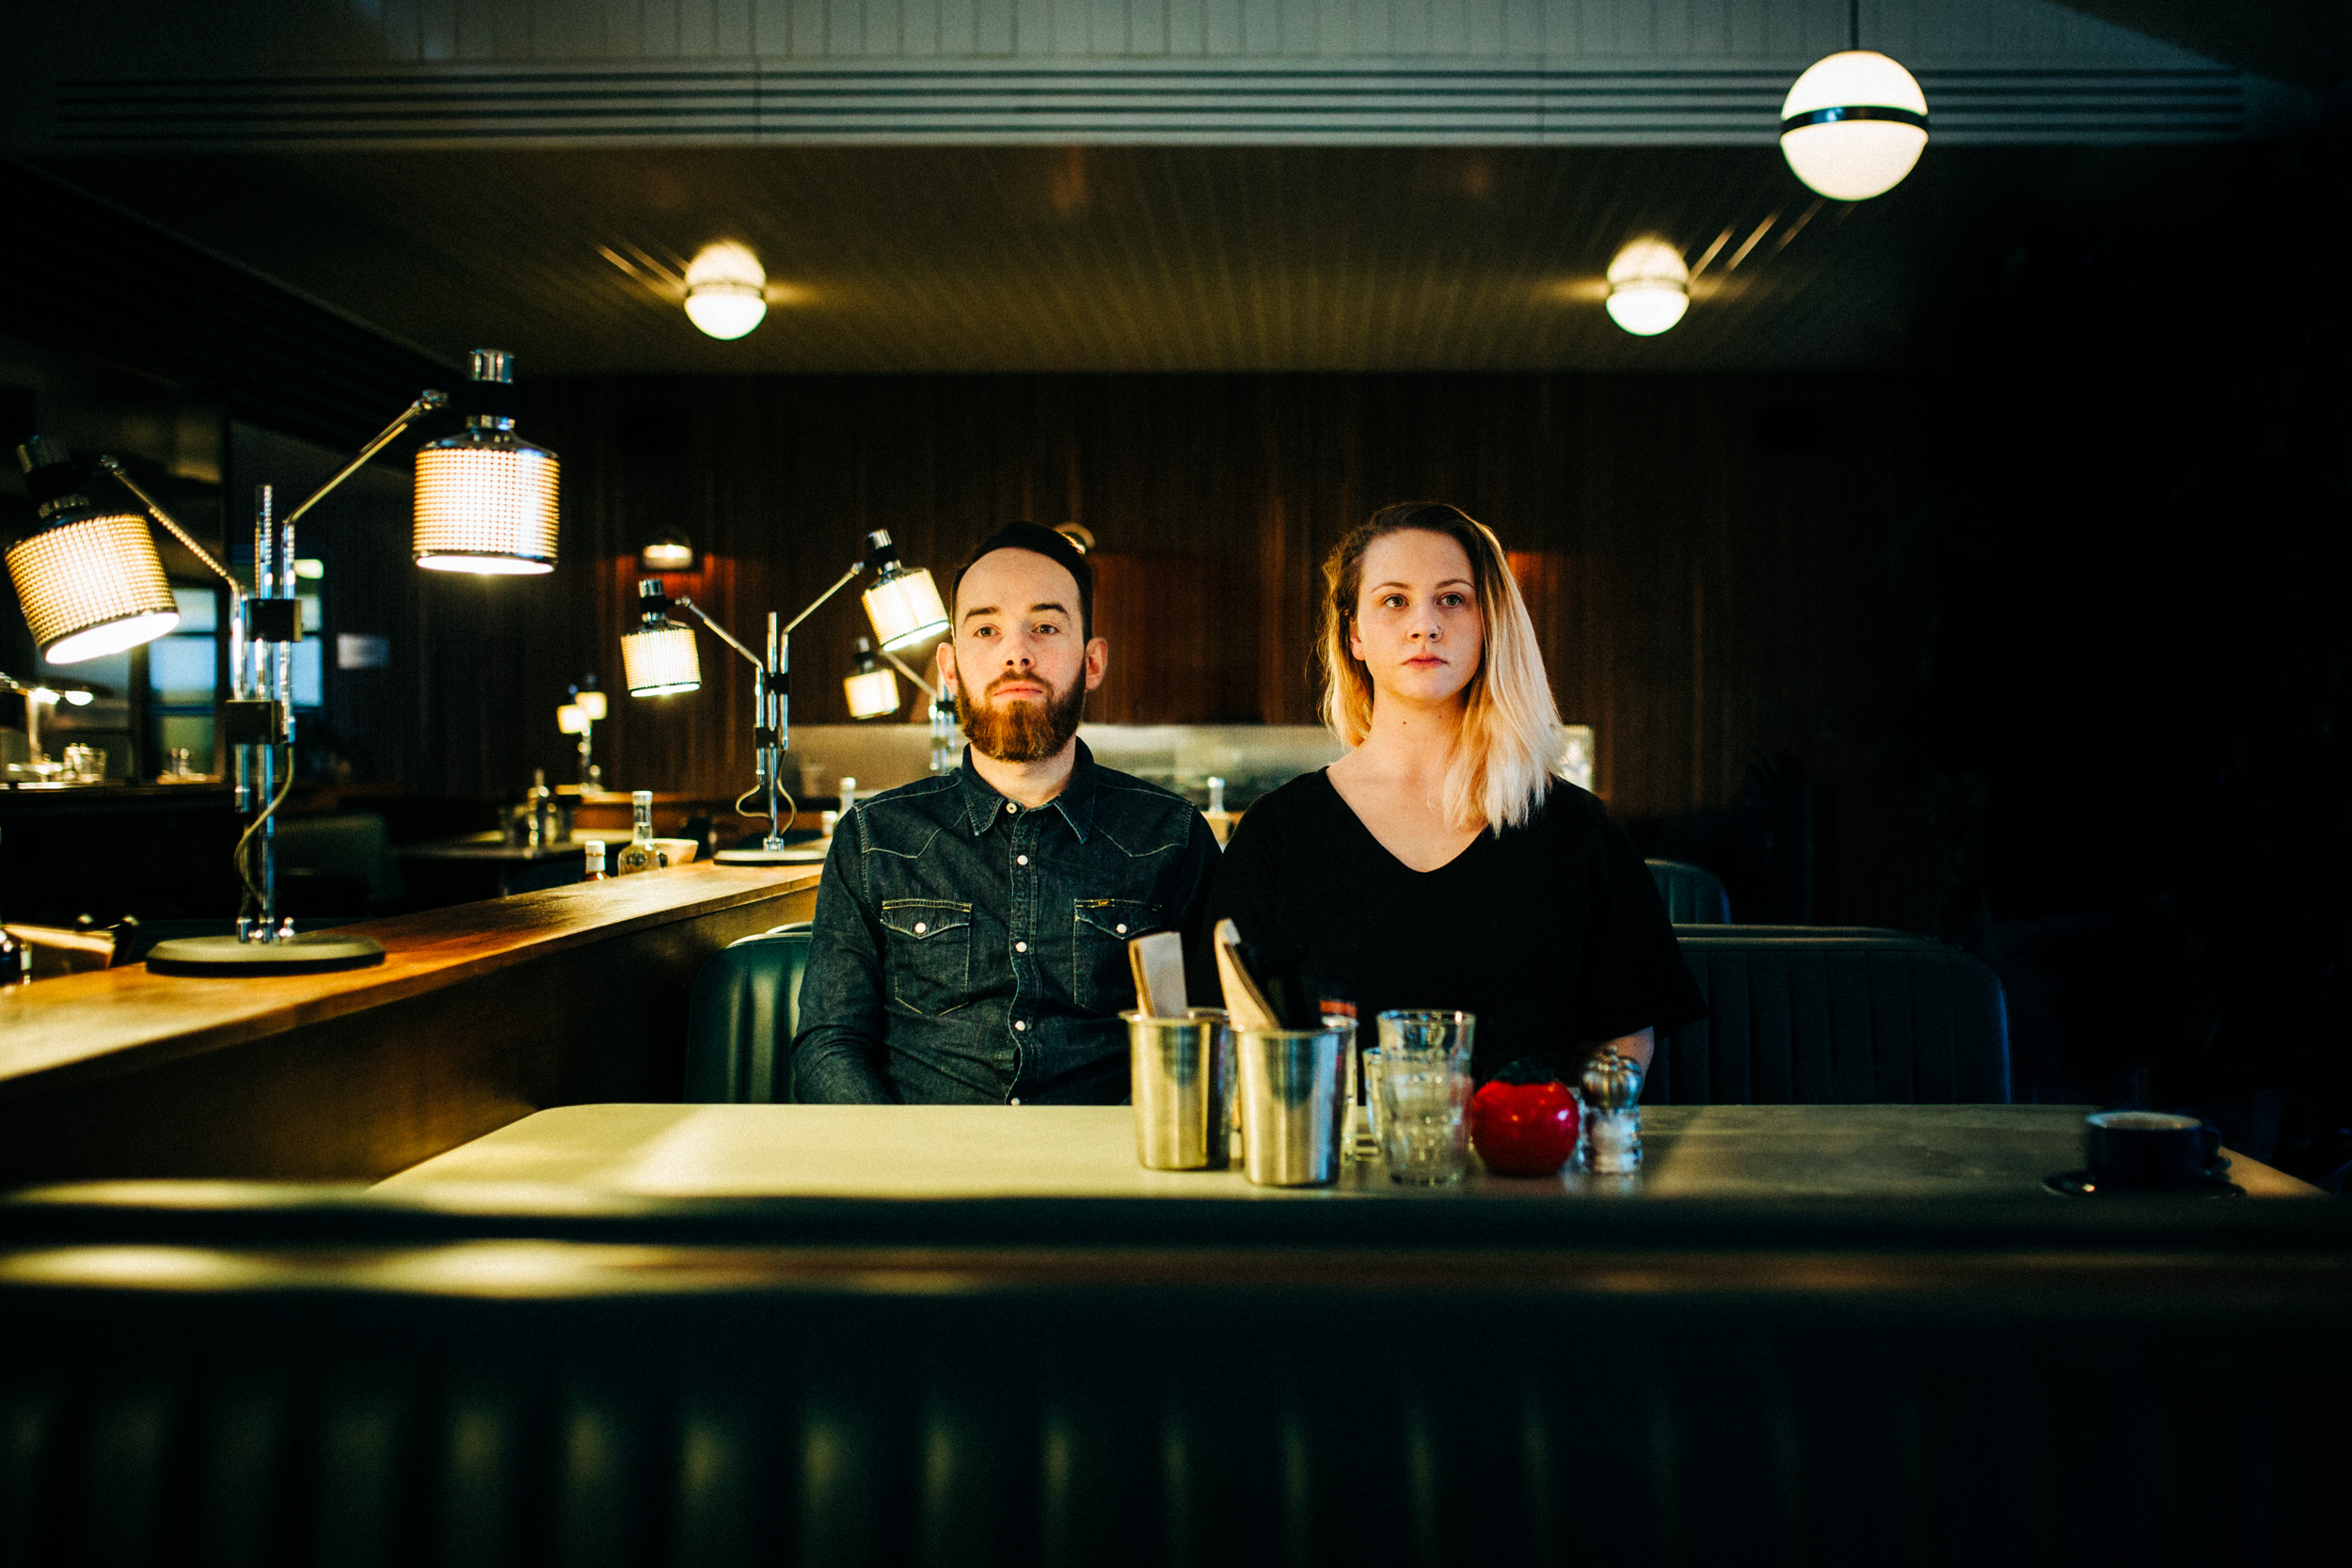 Cardiff Photographer Alex Sedgmond - Photography South Wales - Mollies Motel Oxfordshire Couple Photography.jpg